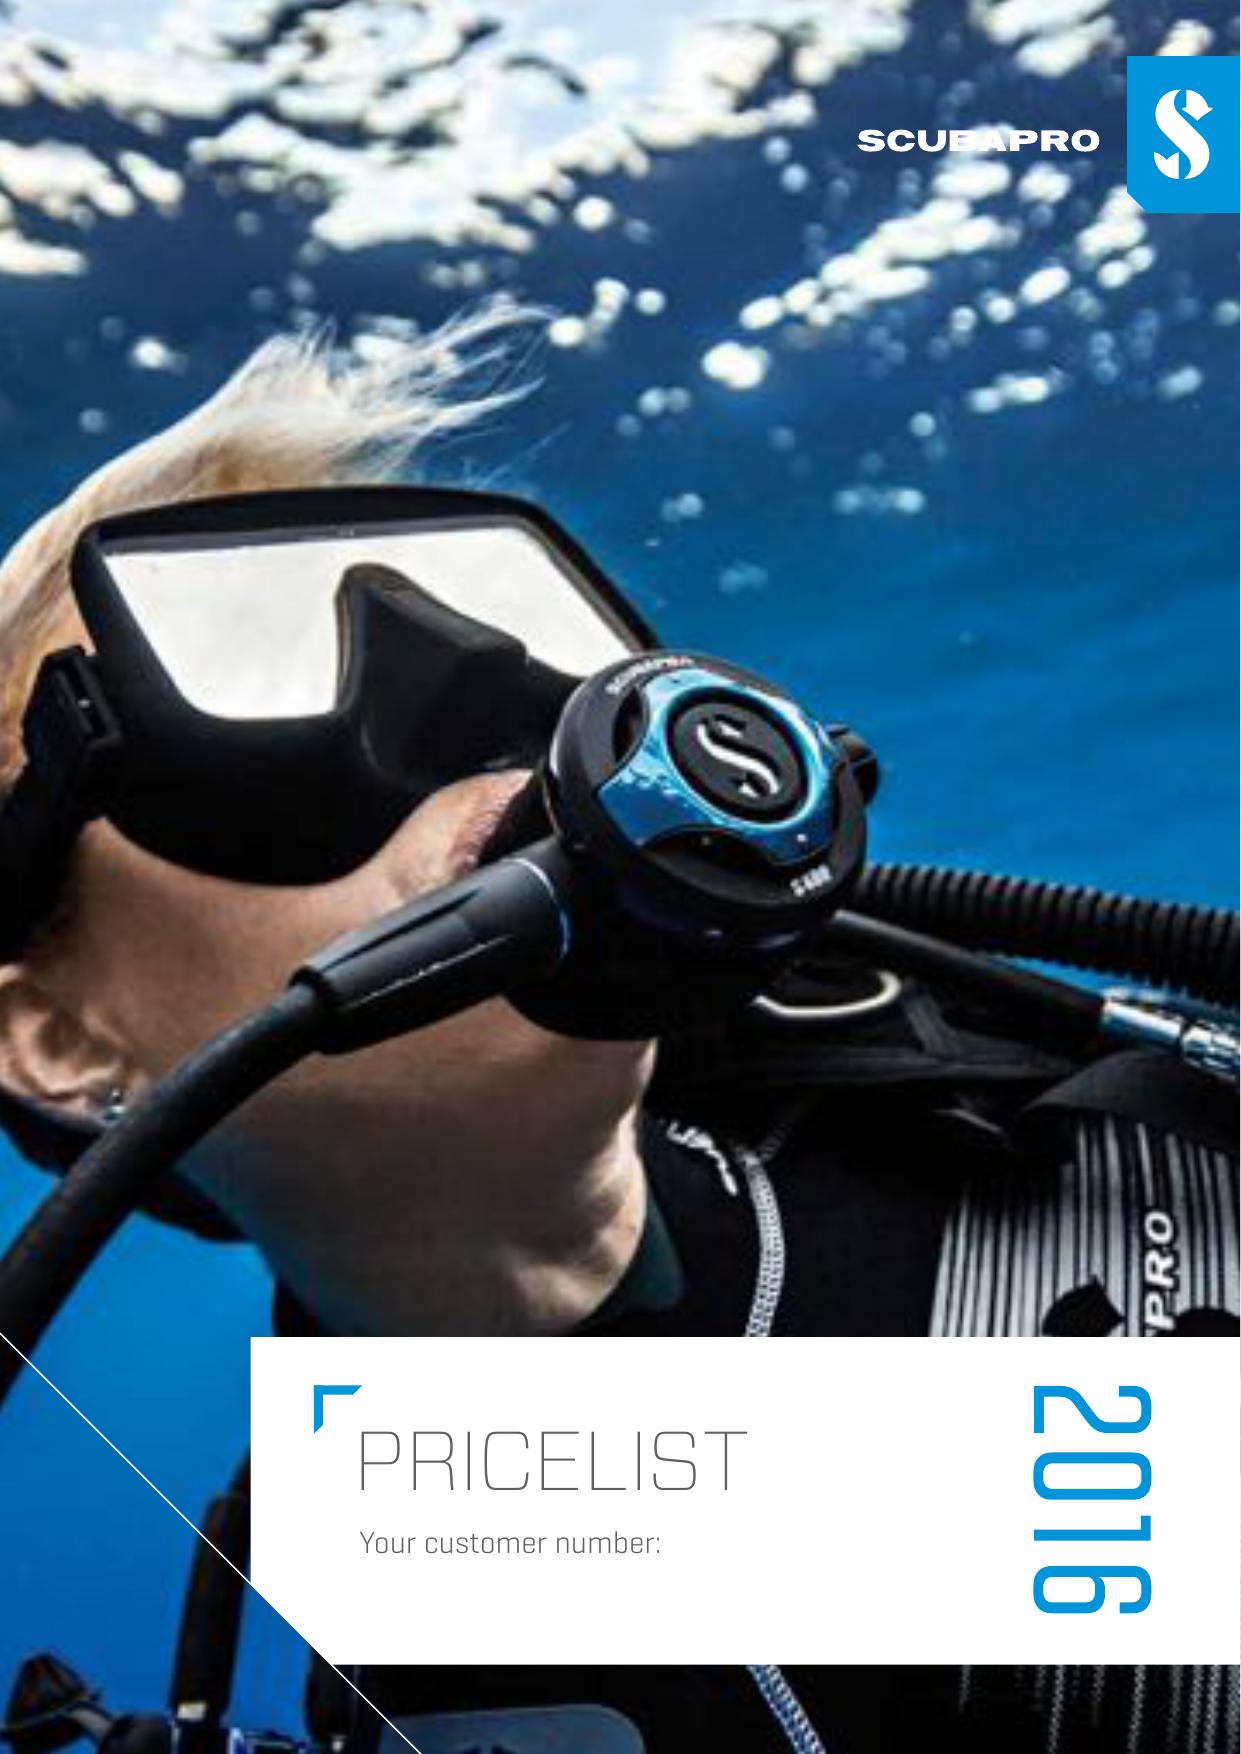 pricelist - Scubatom | manualzz com